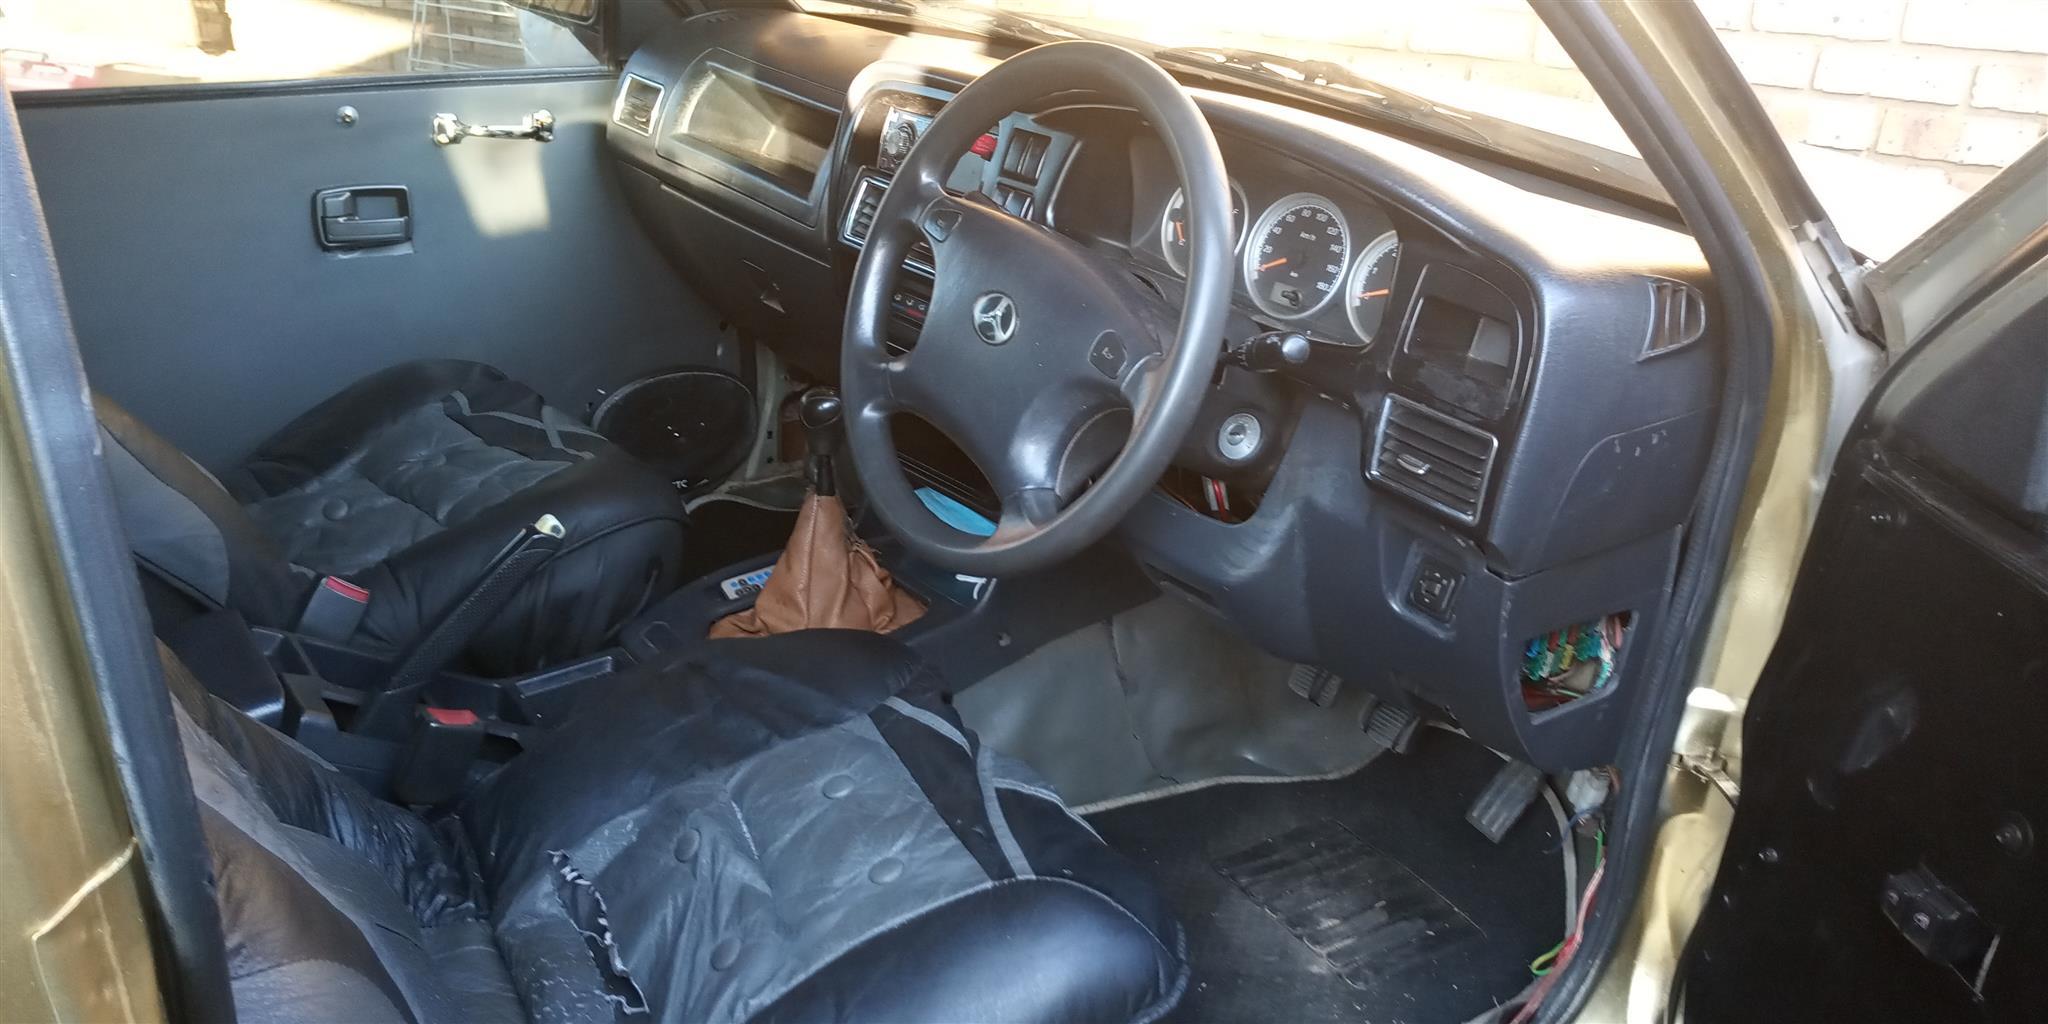 2010 CAM Rhino 2.2i Luxury